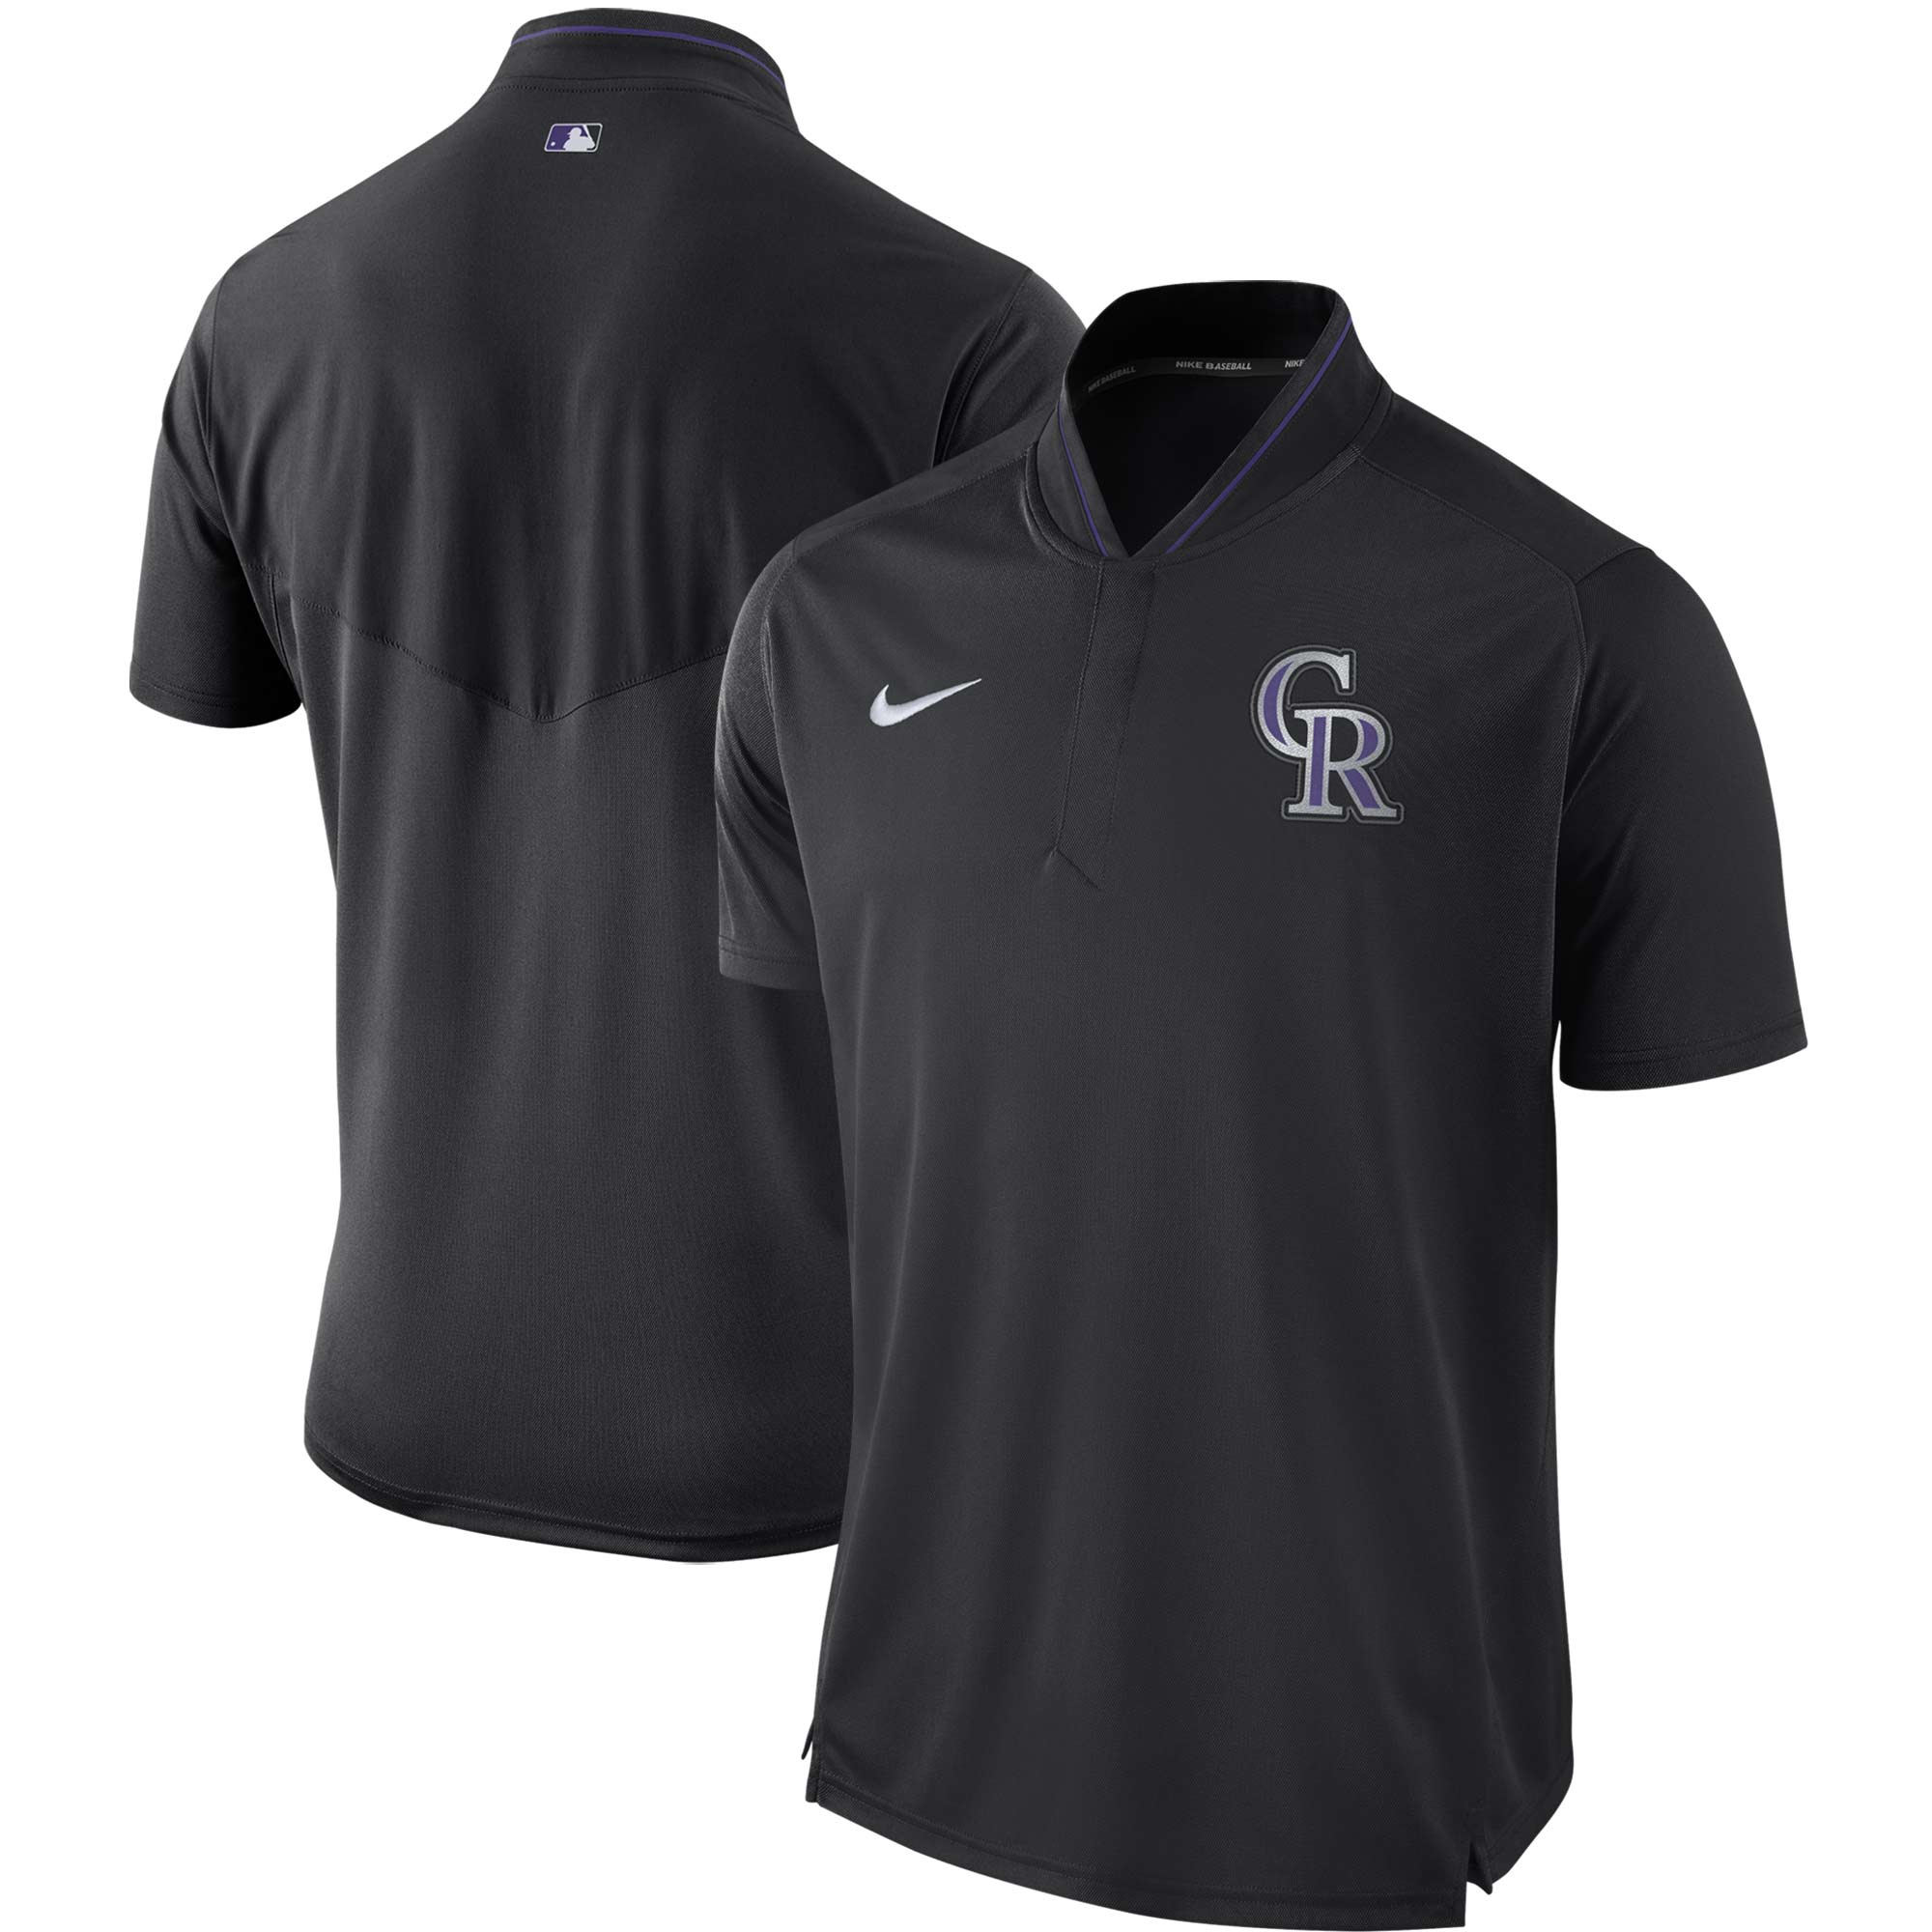 Colorado Rockies Nike Authentic Collection Elite Performance Polo - Black